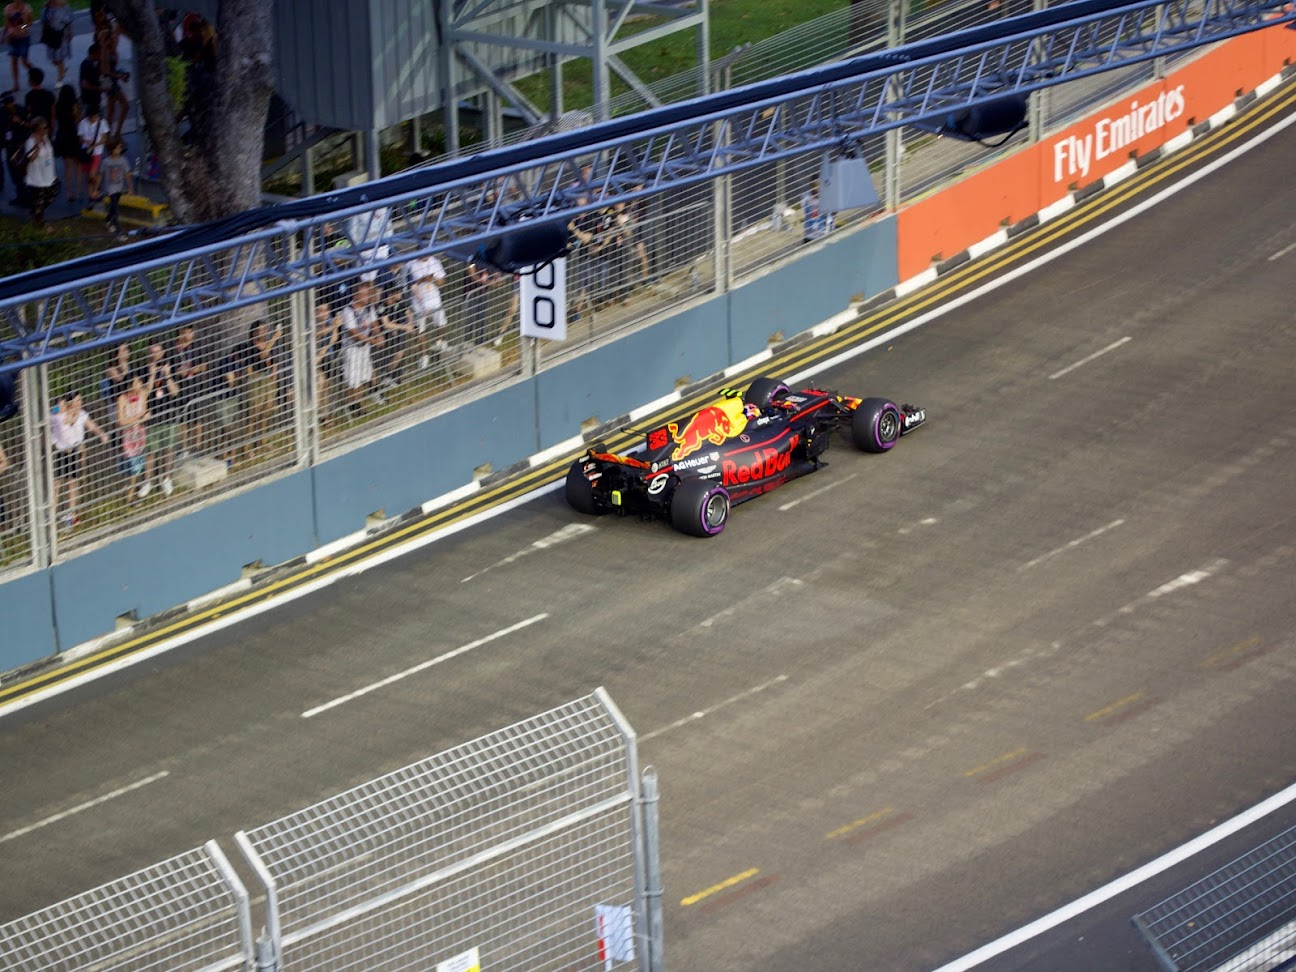 Singapore GP 2017 Practice 3